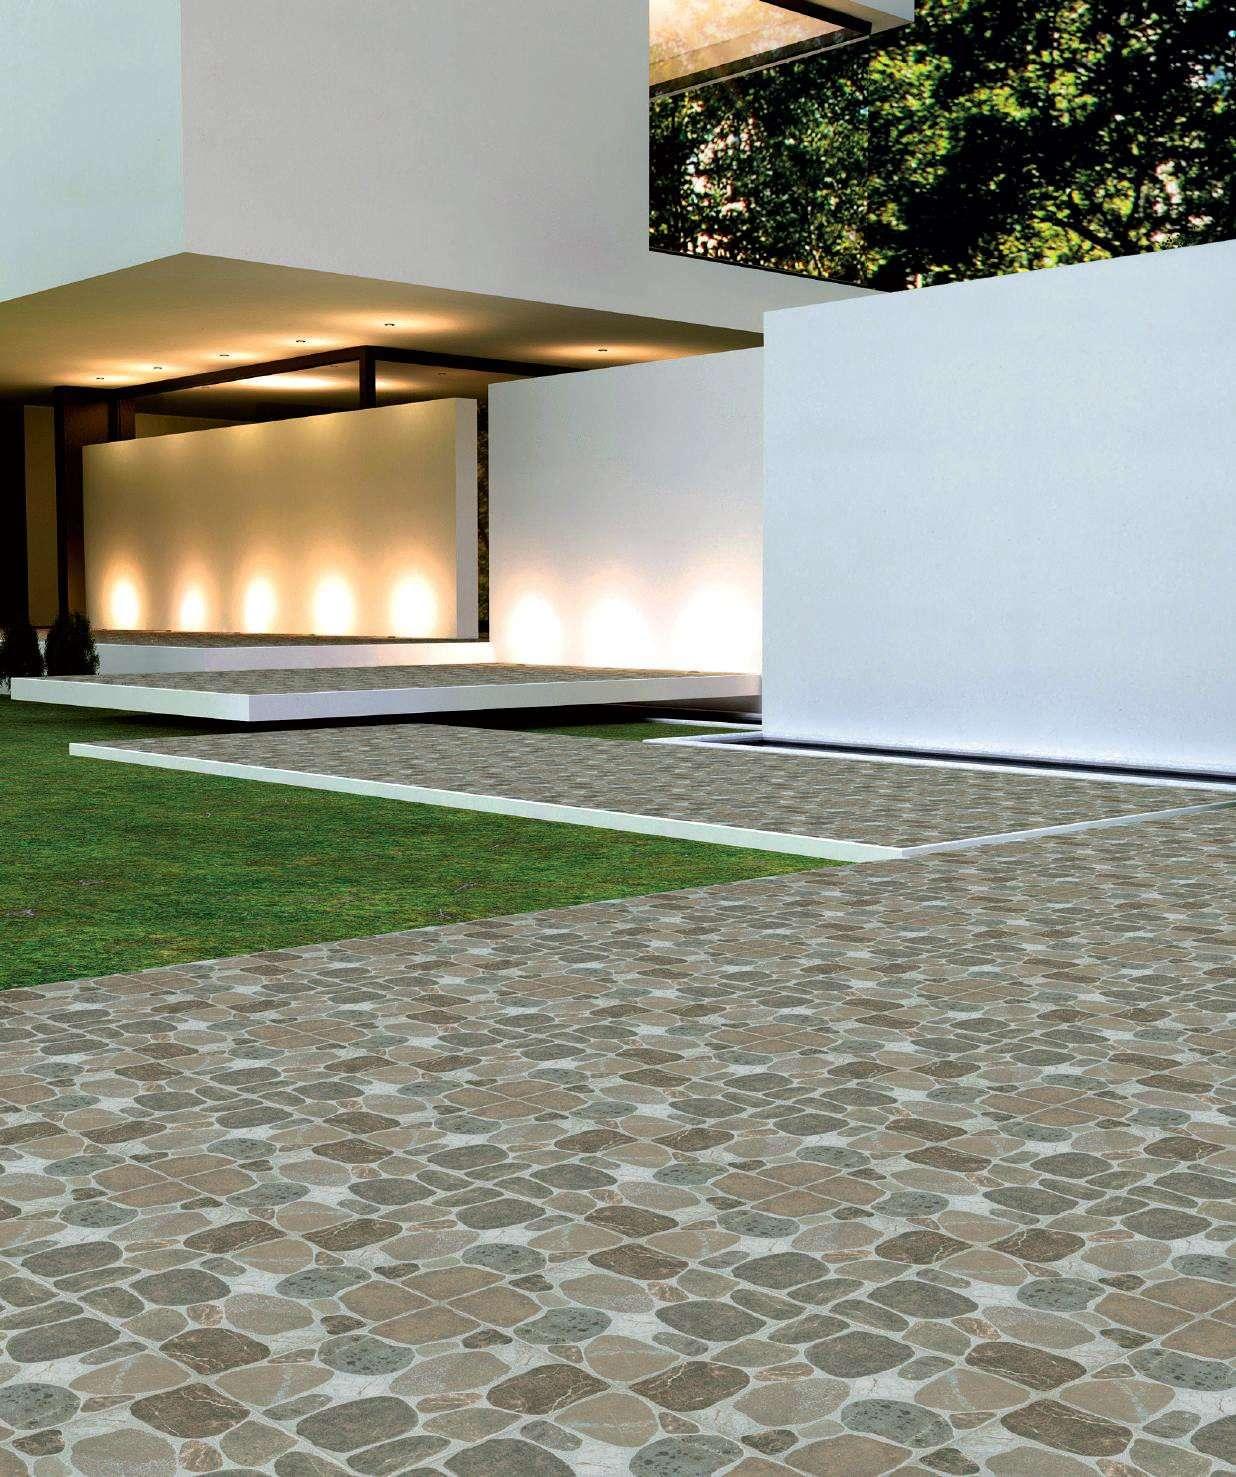 Benoic - gallery